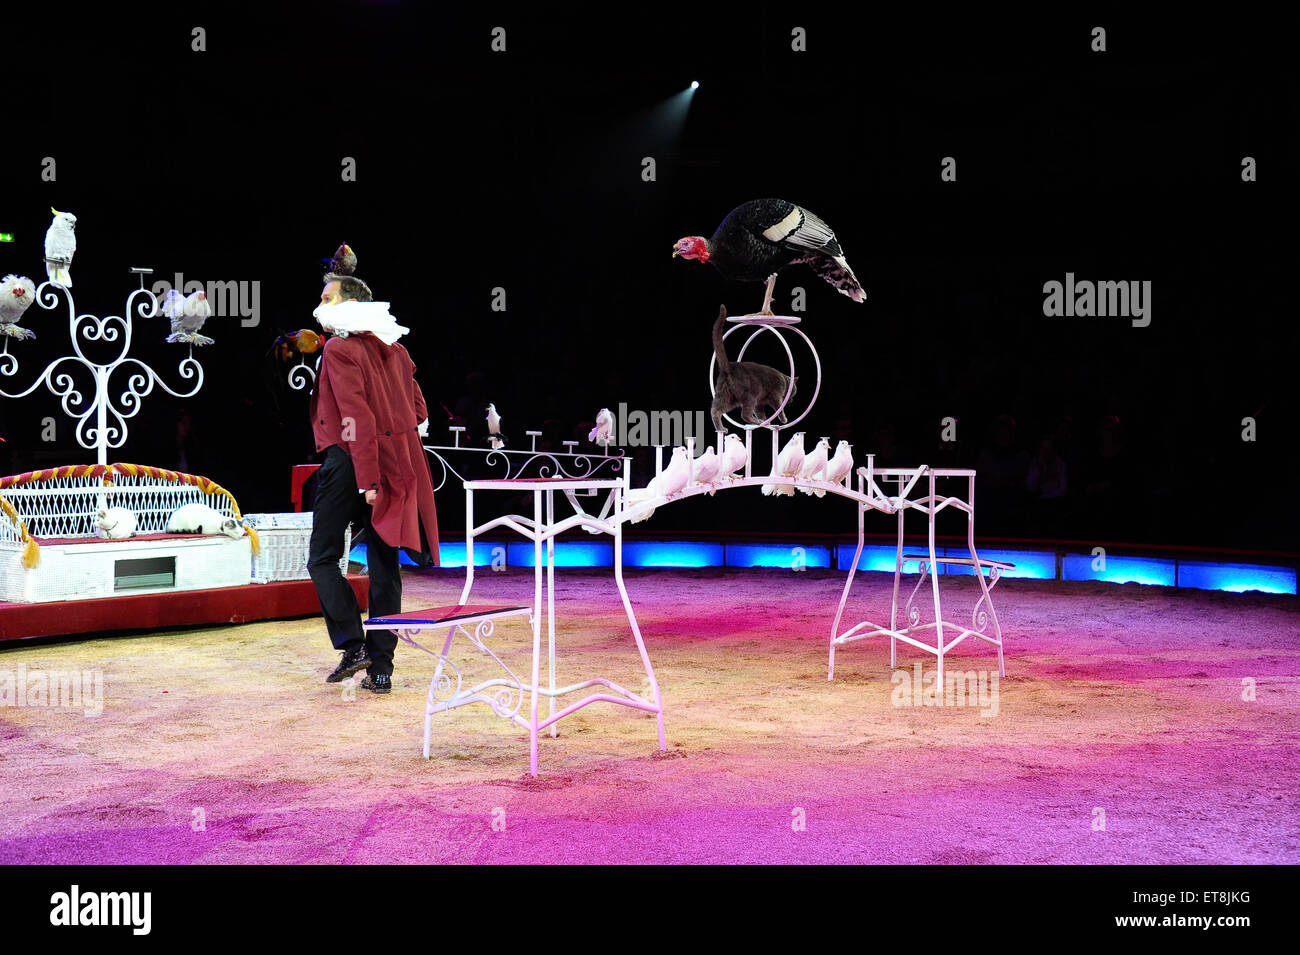 Premiere of the winter program of circus Krone  Featuring: Krenzola Jr.mit Kleintier Revue Where: Munich, Germany Stock Photo